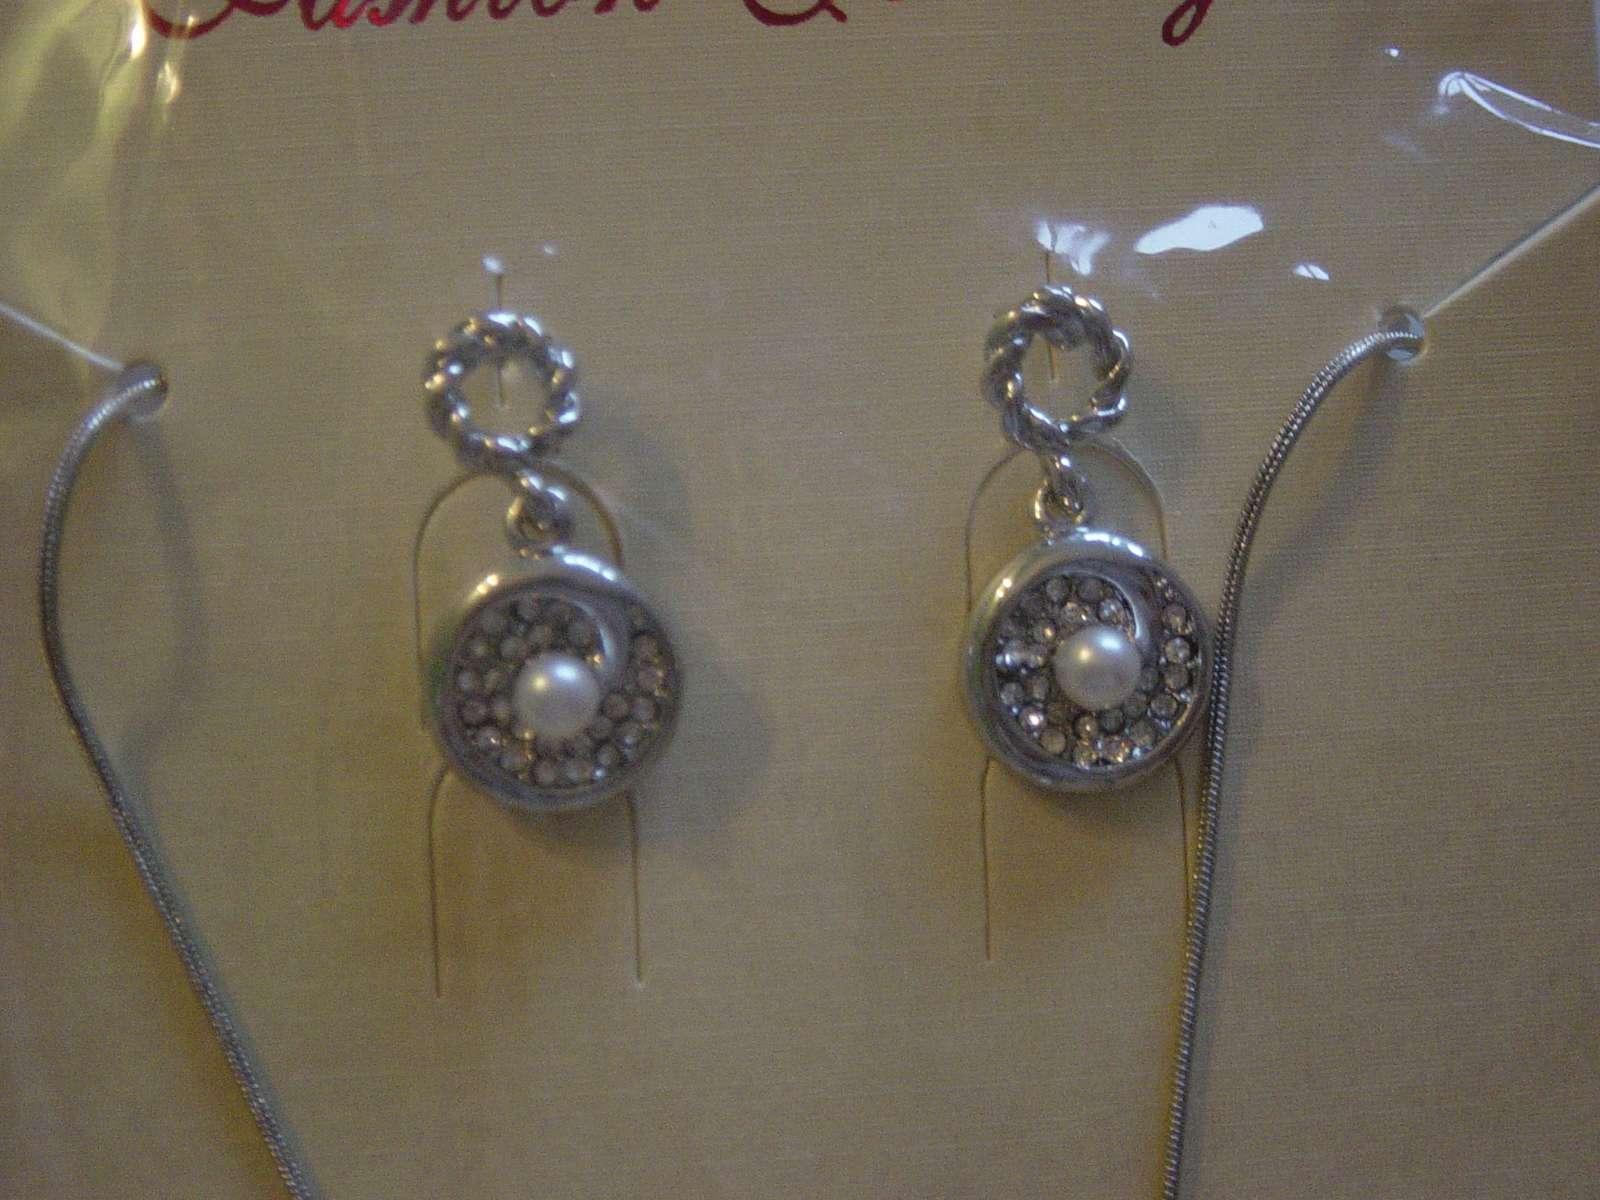 Náhrdelník a náušničky s perlou a kryštálmi - Obrázok č. 2